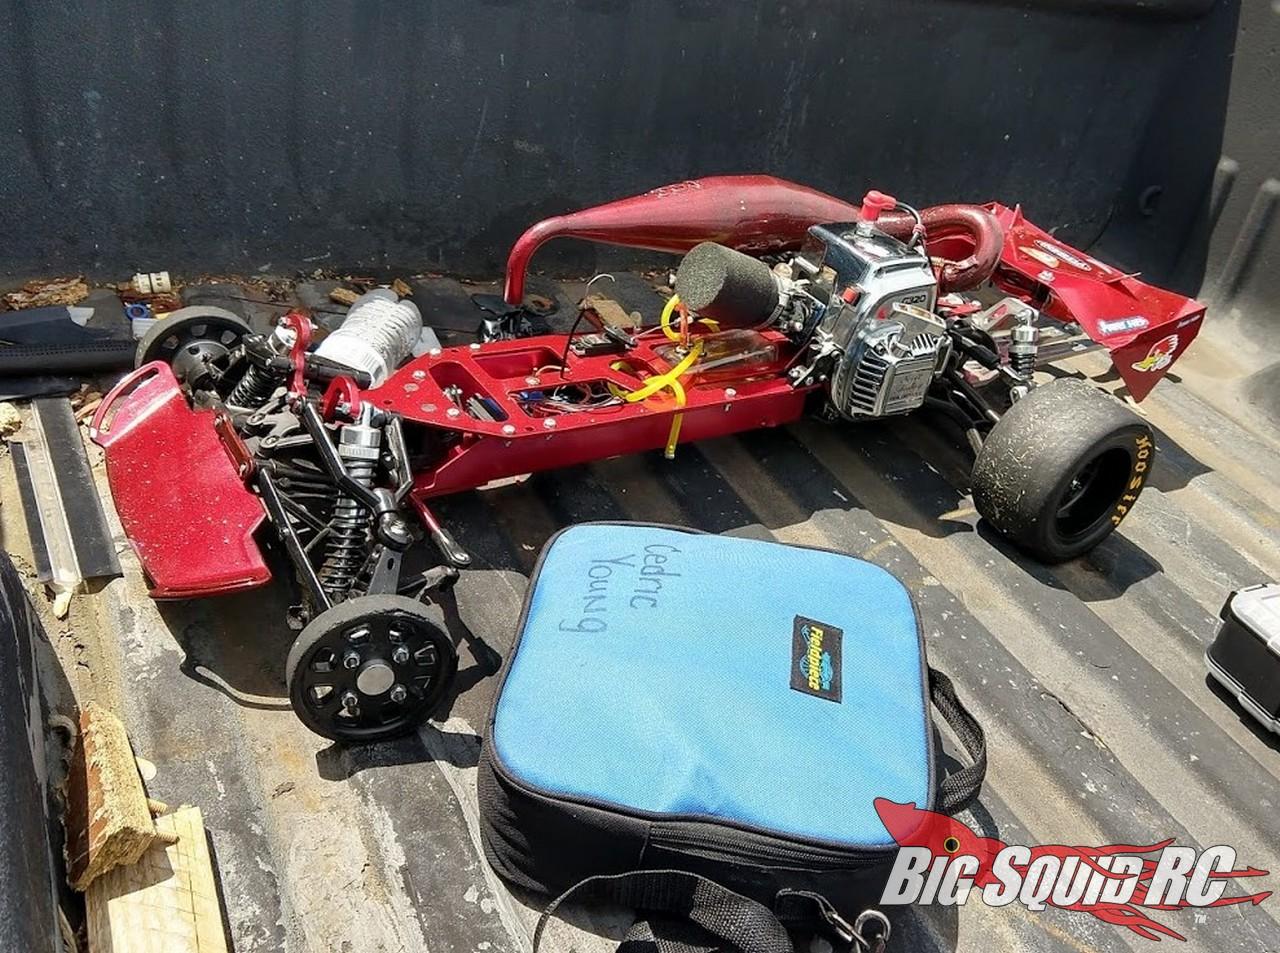 Monster Truck Rc Cars >> Coverage – STL RC Drag Racing Club No Prep 1/5 Drag Racing Championships « Big Squid RC – RC Car ...